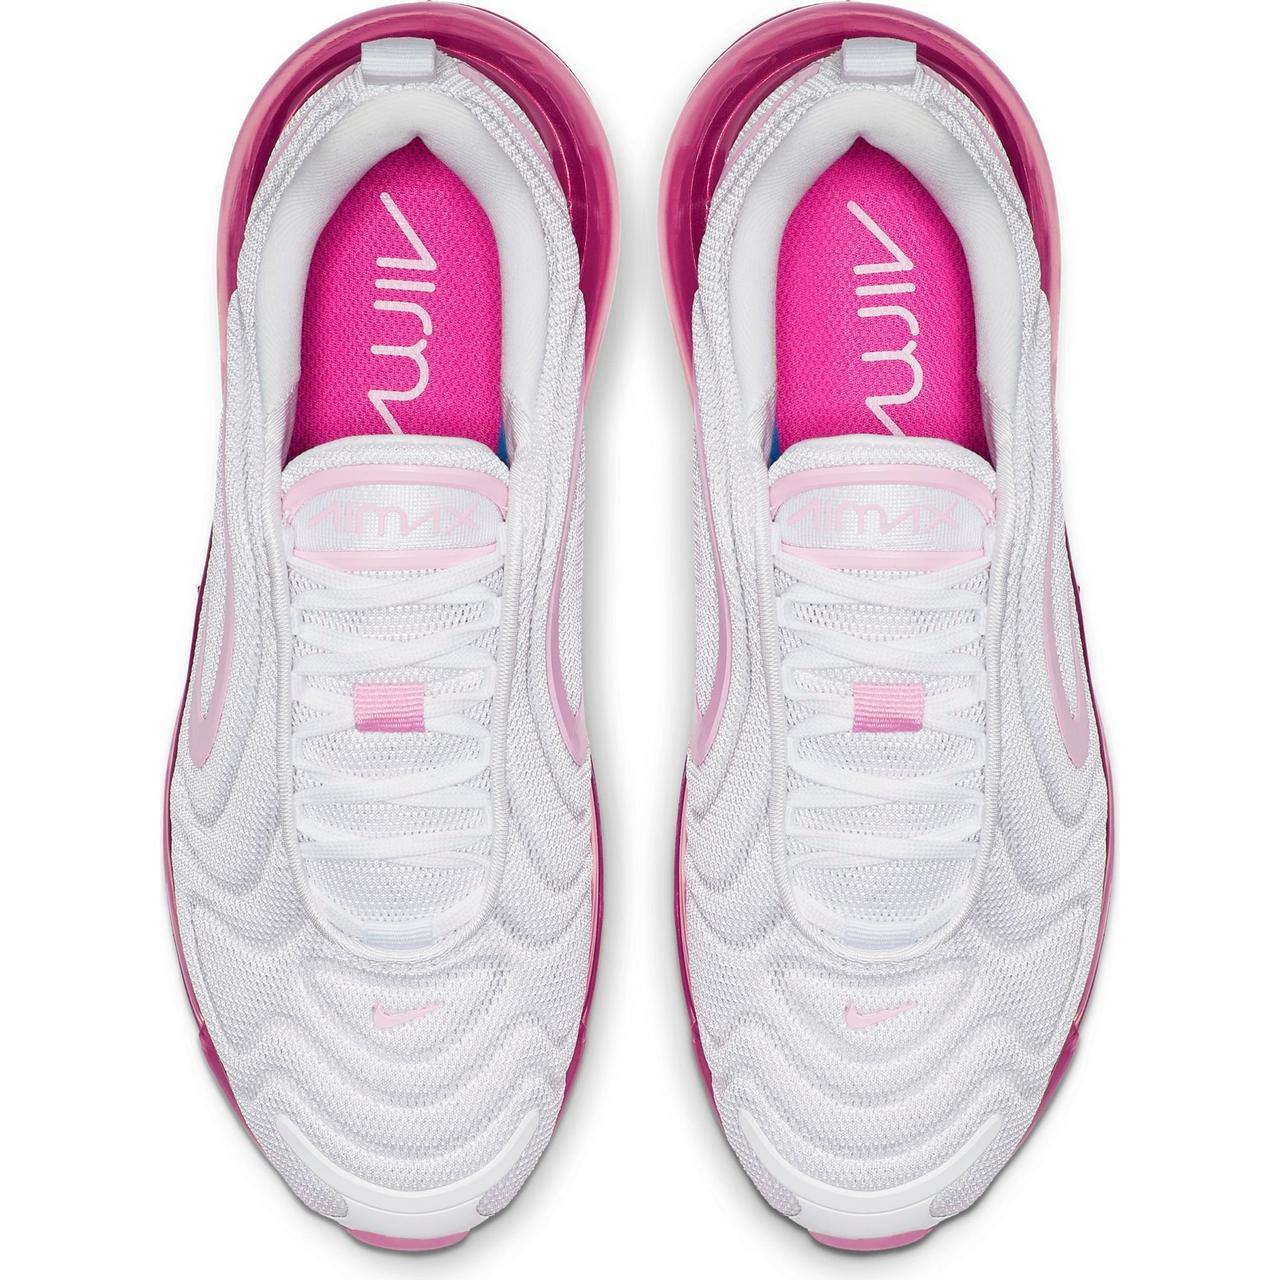 Nike Junior Air Max 720 WhitePink Sneaker